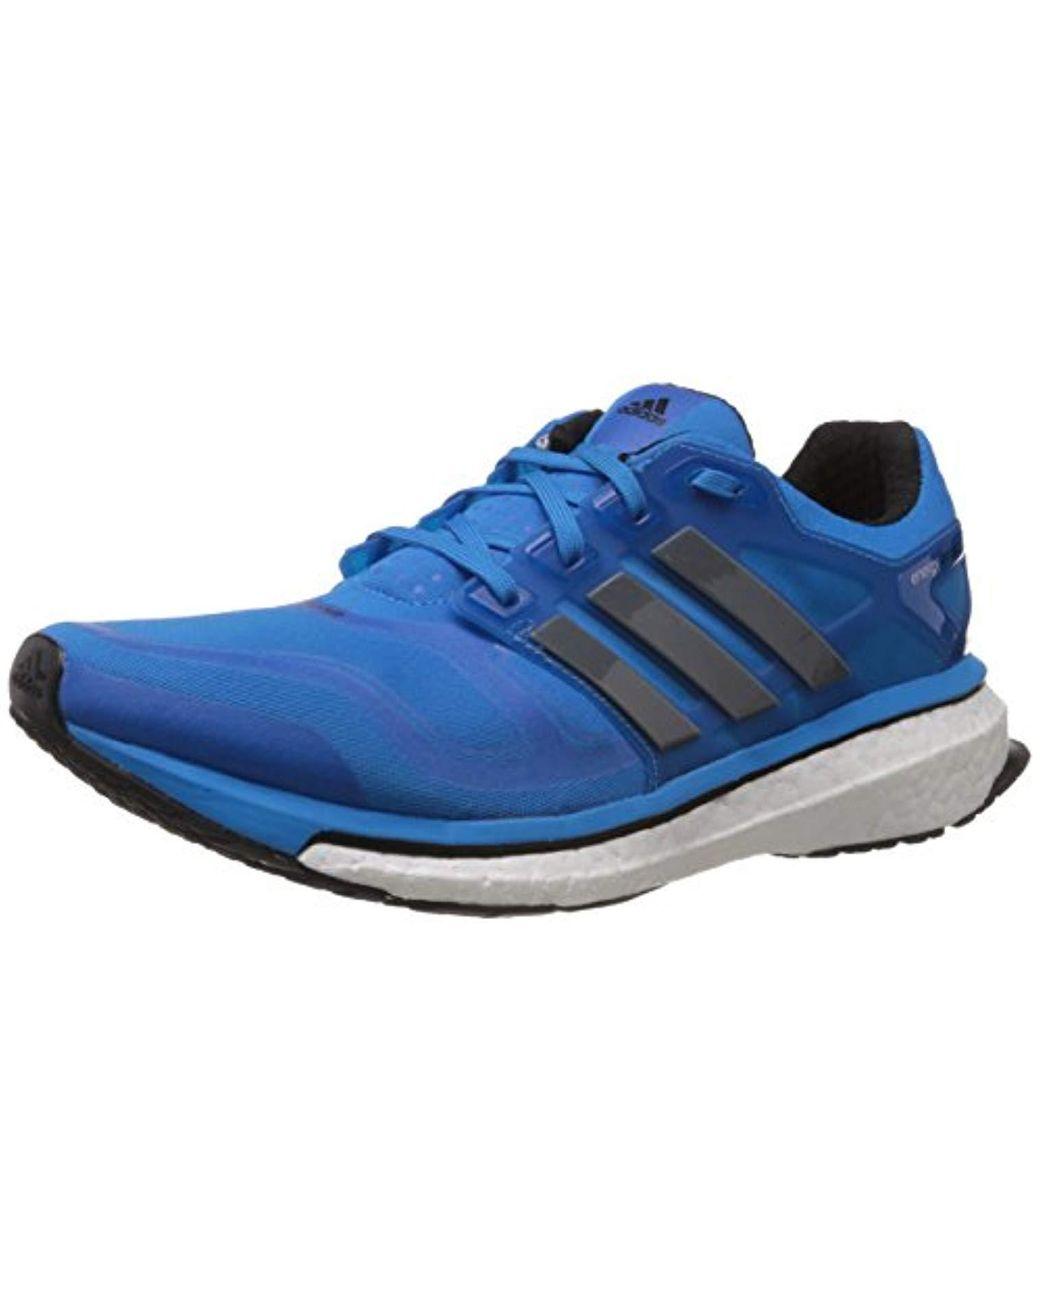 Men's Adidas Energy Boost 2m